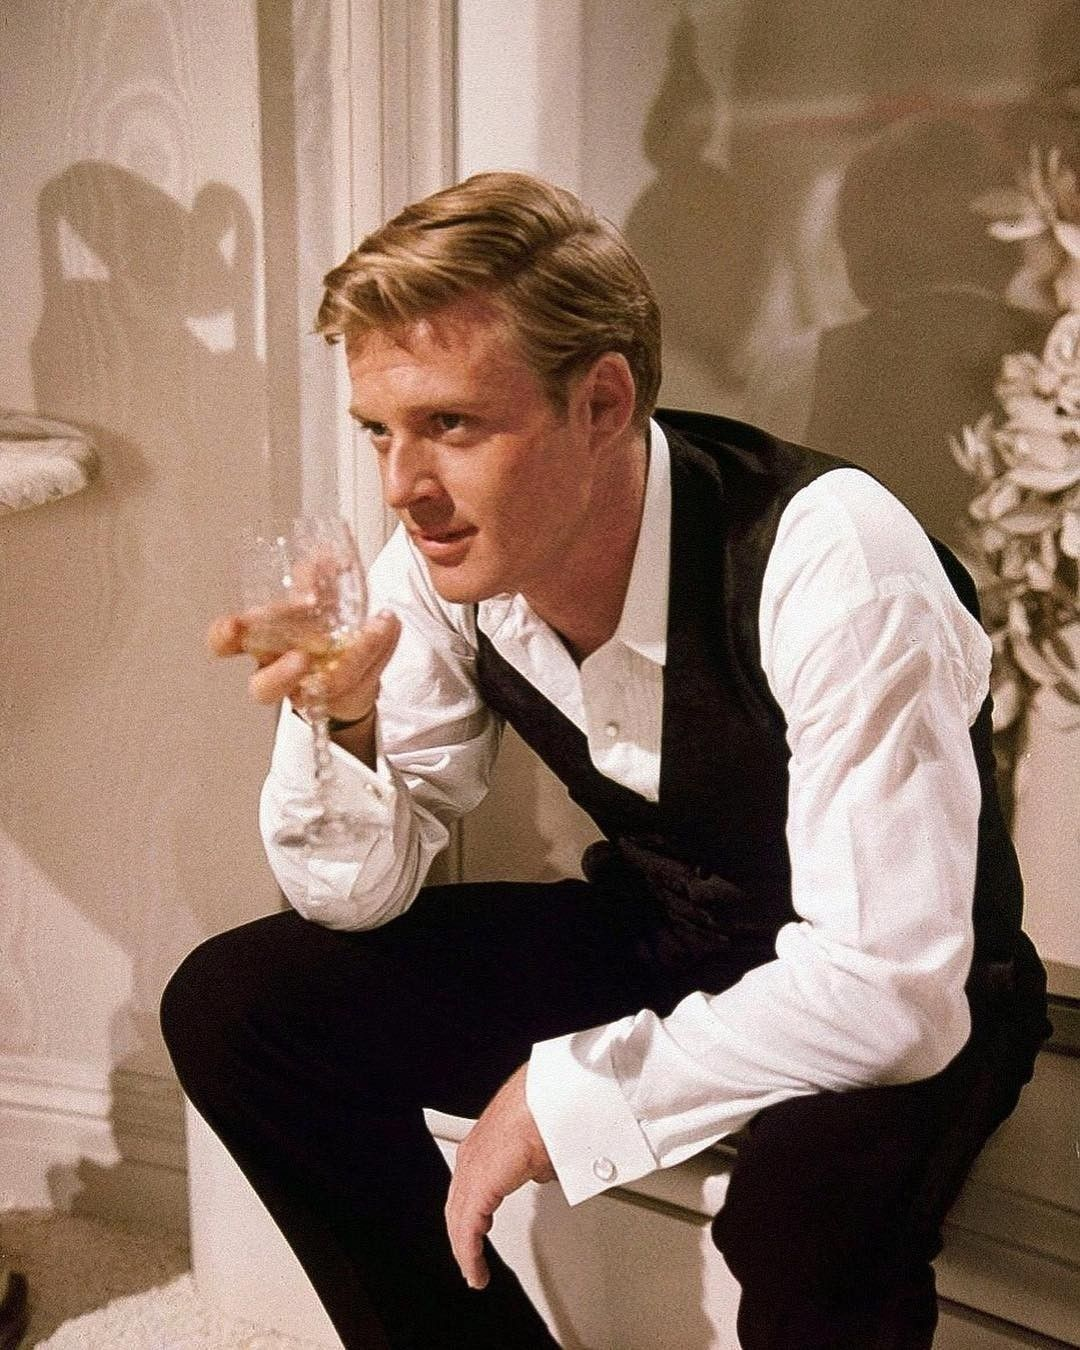 Robert Redford in 1956 | Actor, Robert redford, Richard gere